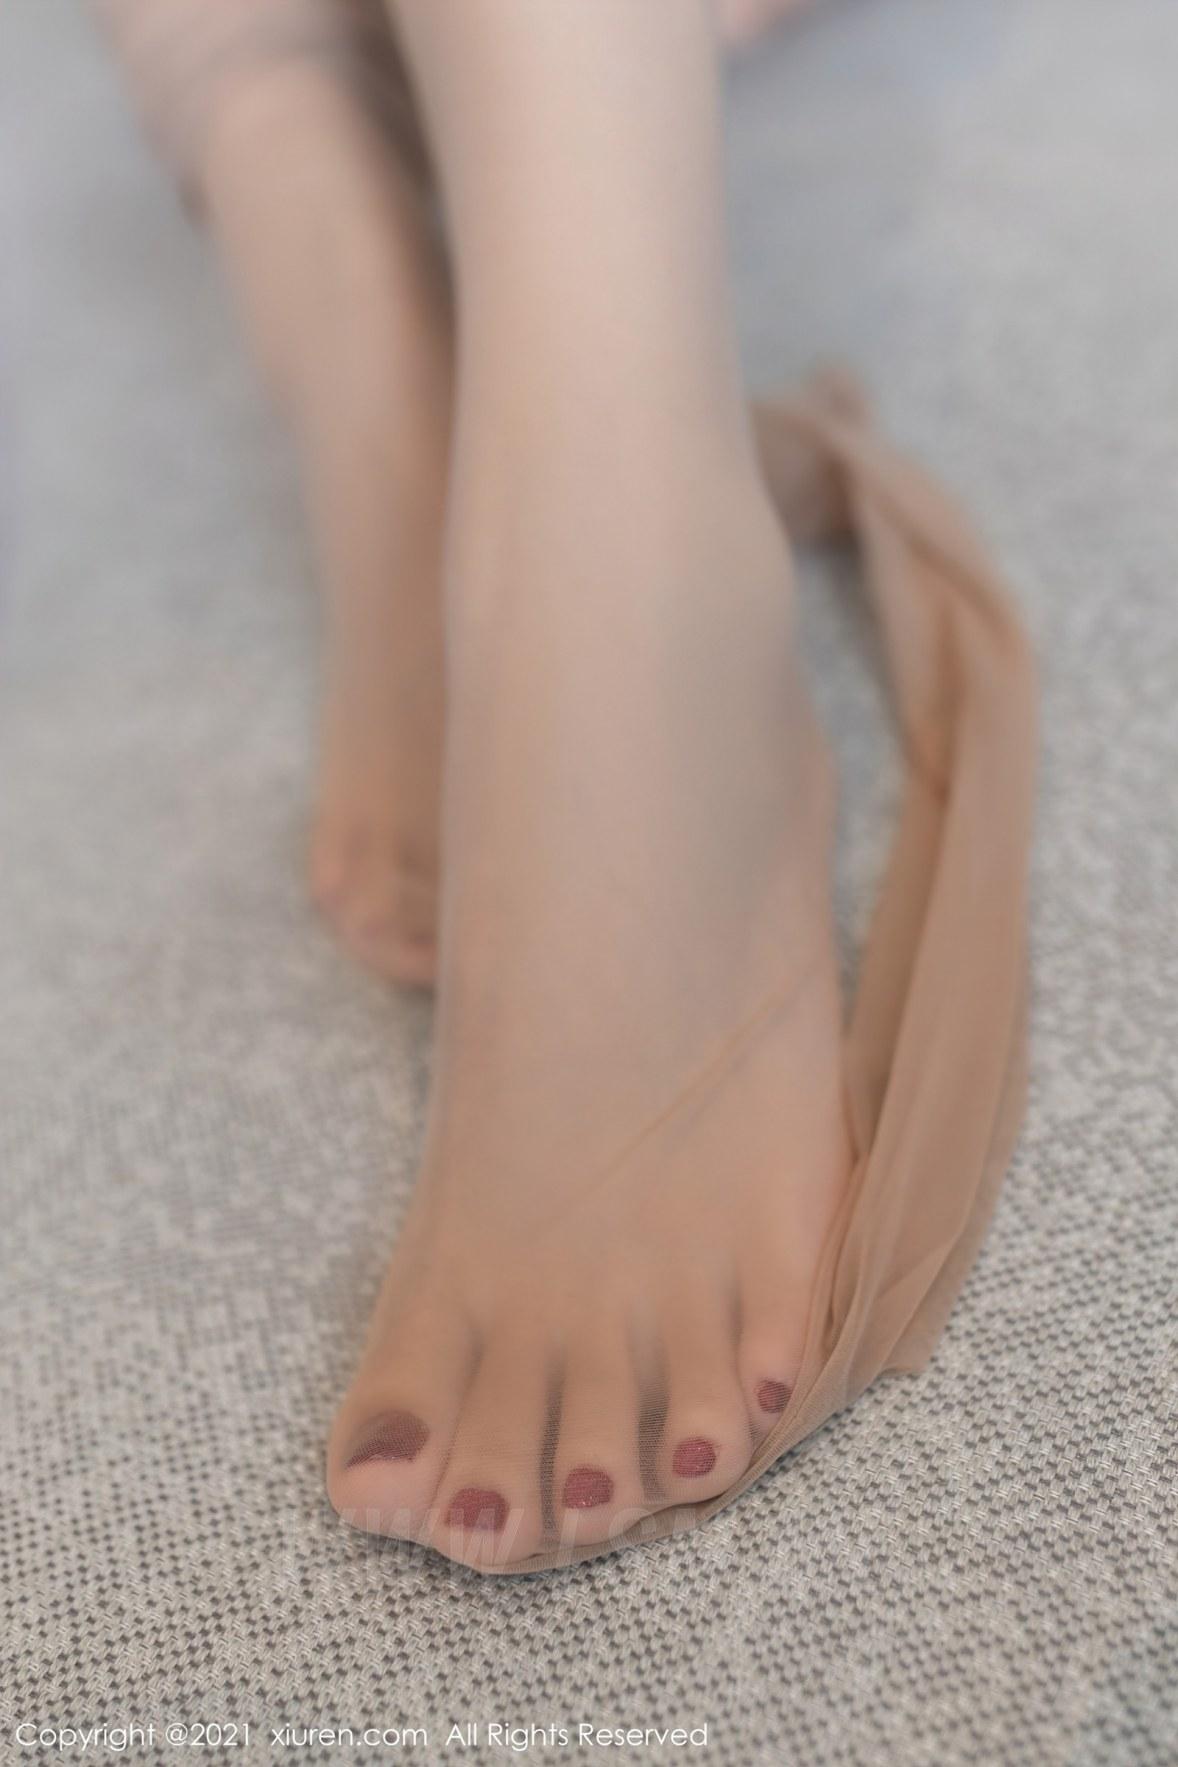 3780 048 jqs 3600 5400 - XiuRen 秀人 No.3780 裸色裙主题系列 唐安琪 澳门旅拍写真22 - 秀人网 -【免费在线写真】【丽人丝语】